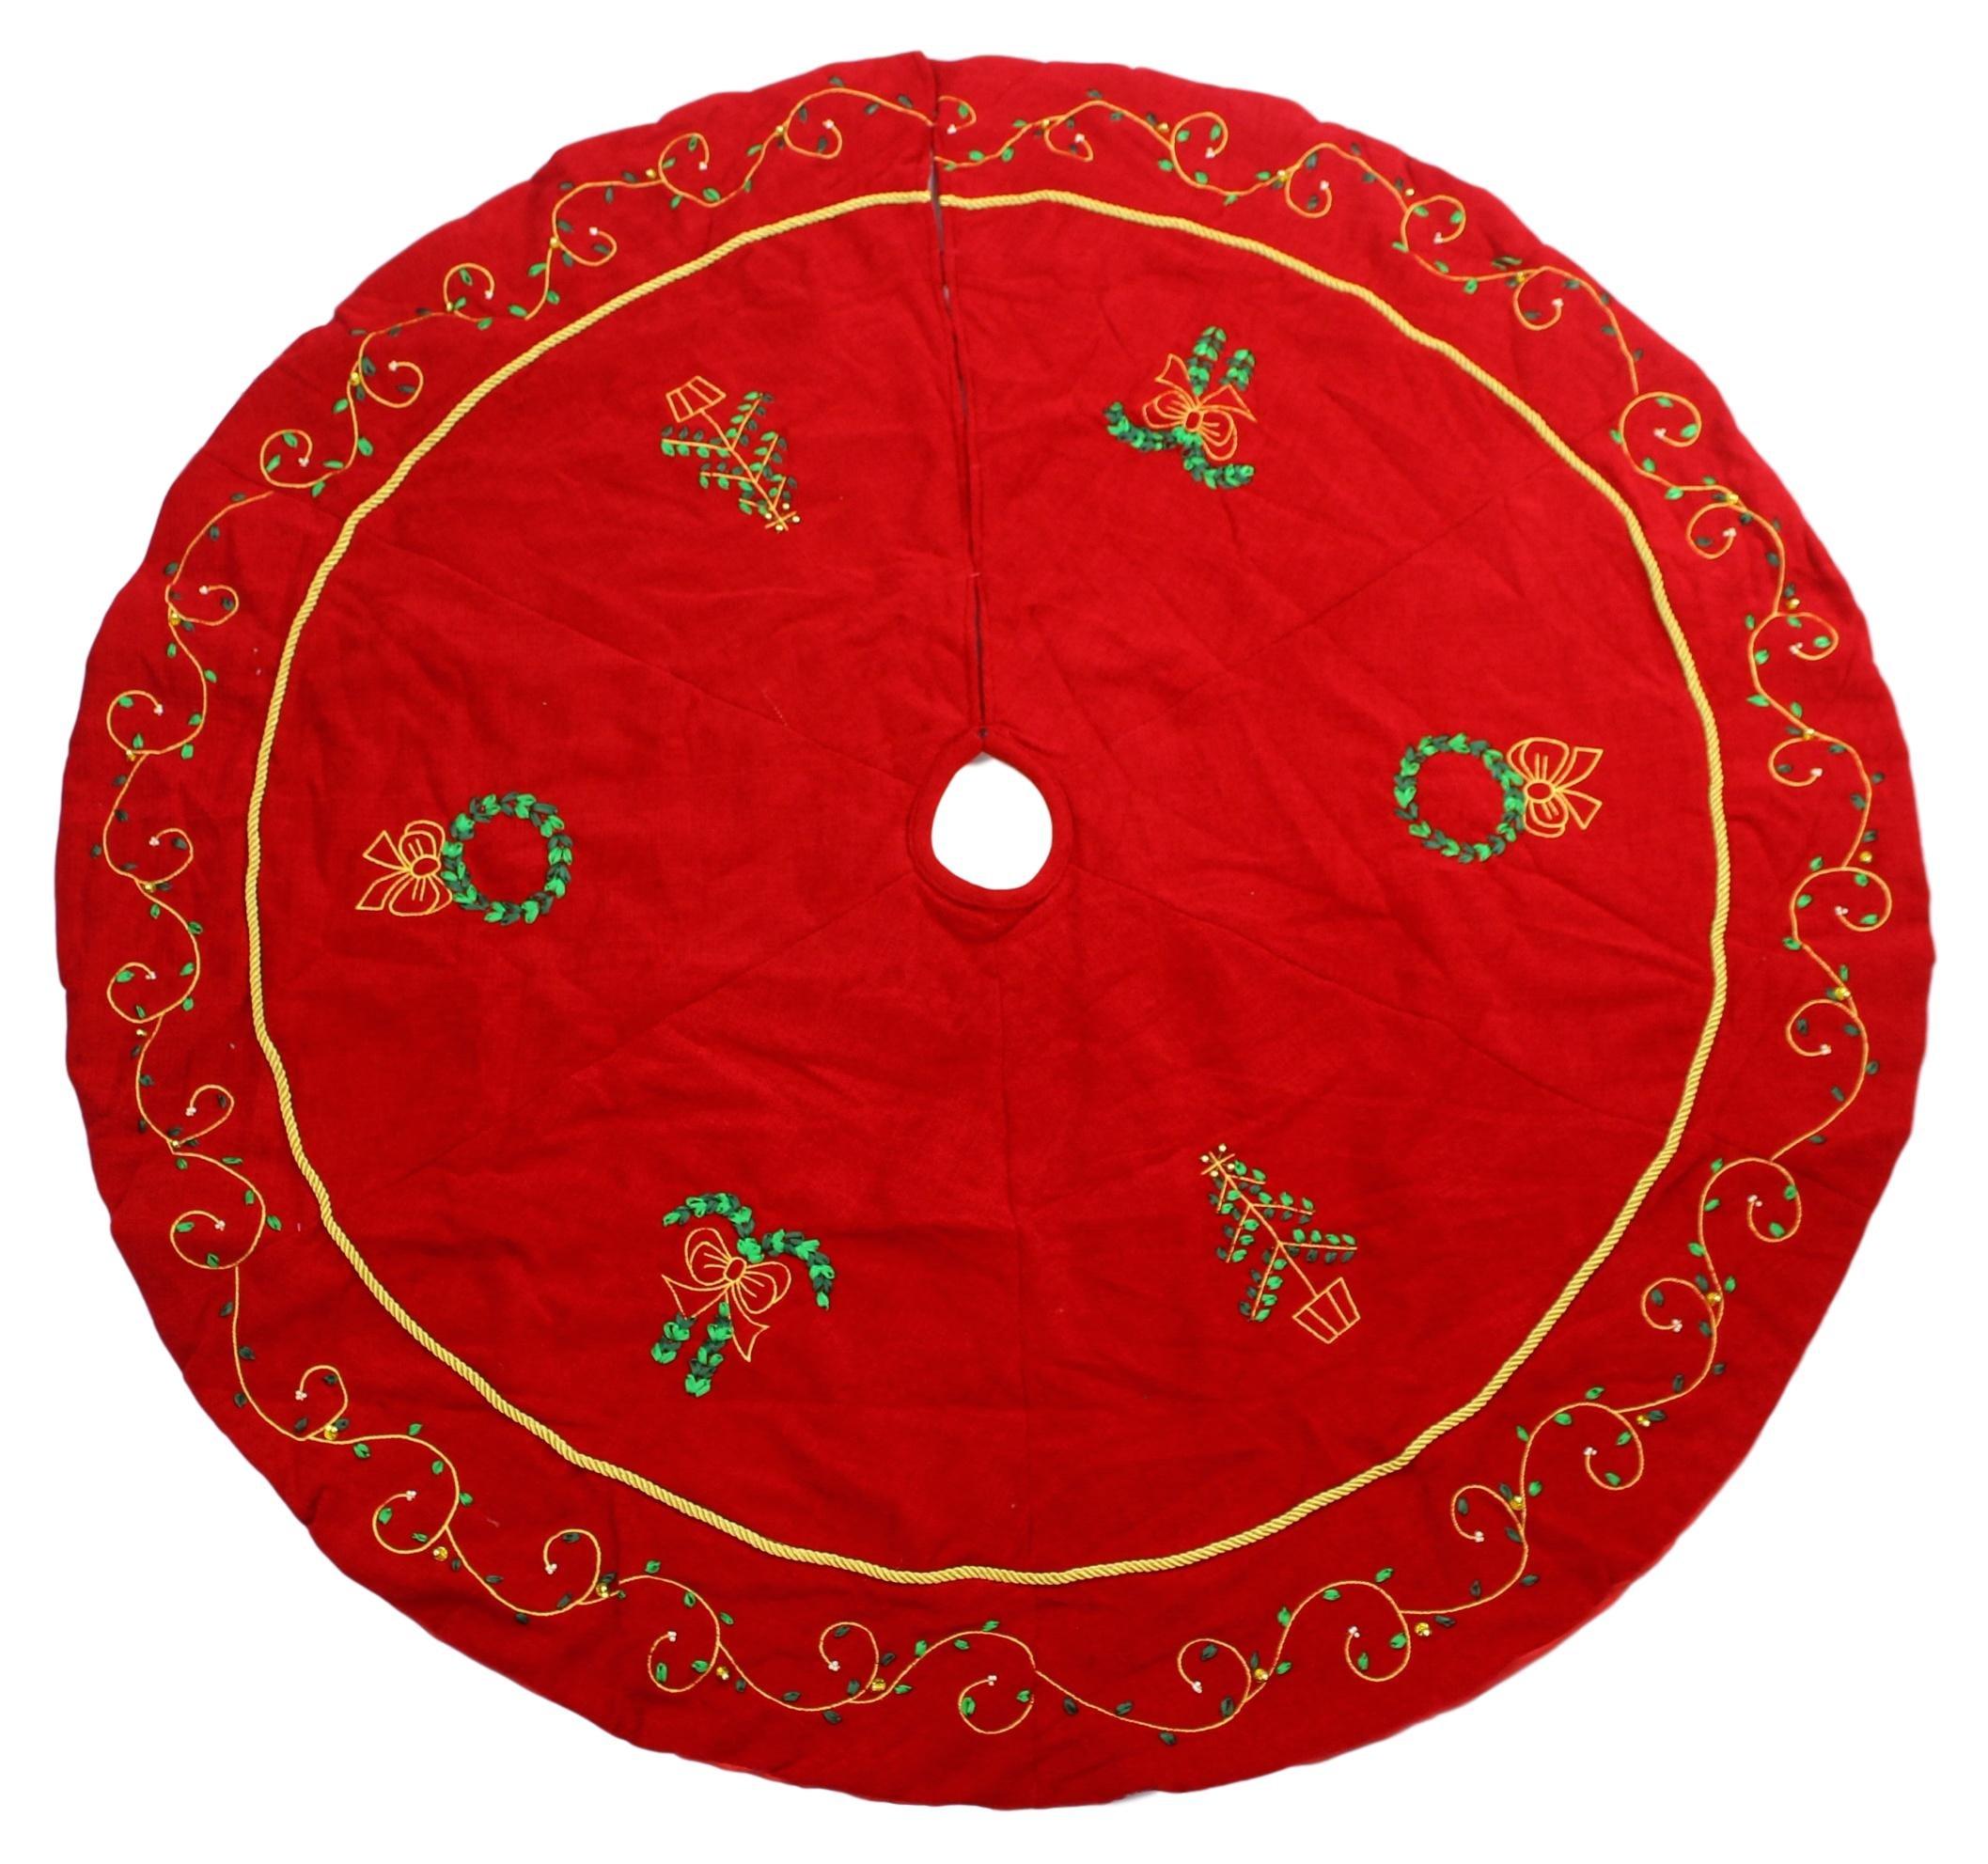 Supree Creations Ltd. 52'' Red Christmas Tree Skirt Embroidered